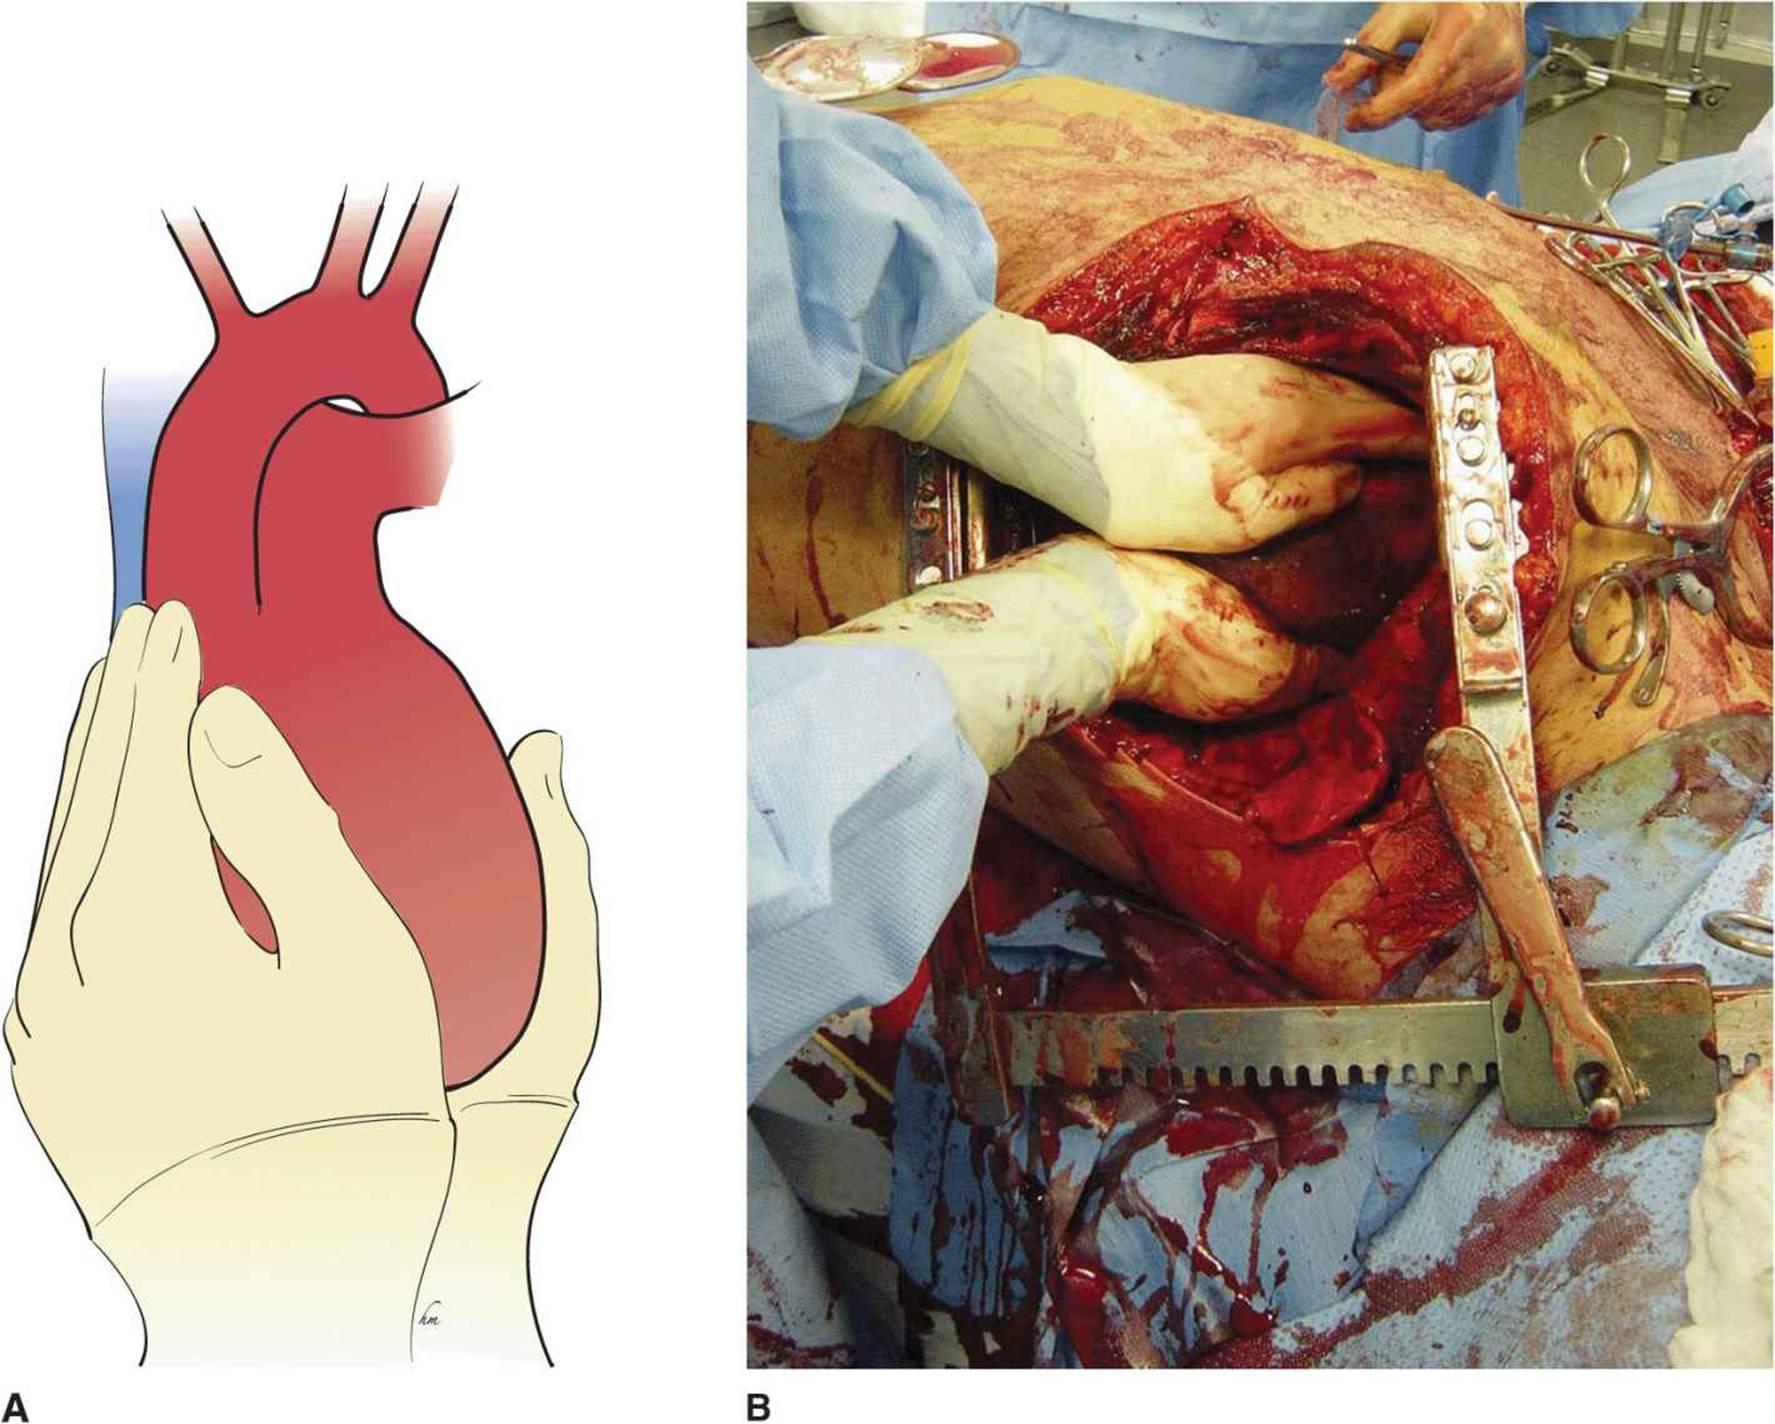 Emergency Department Thoracotomy - Trauma, 7th Ed.